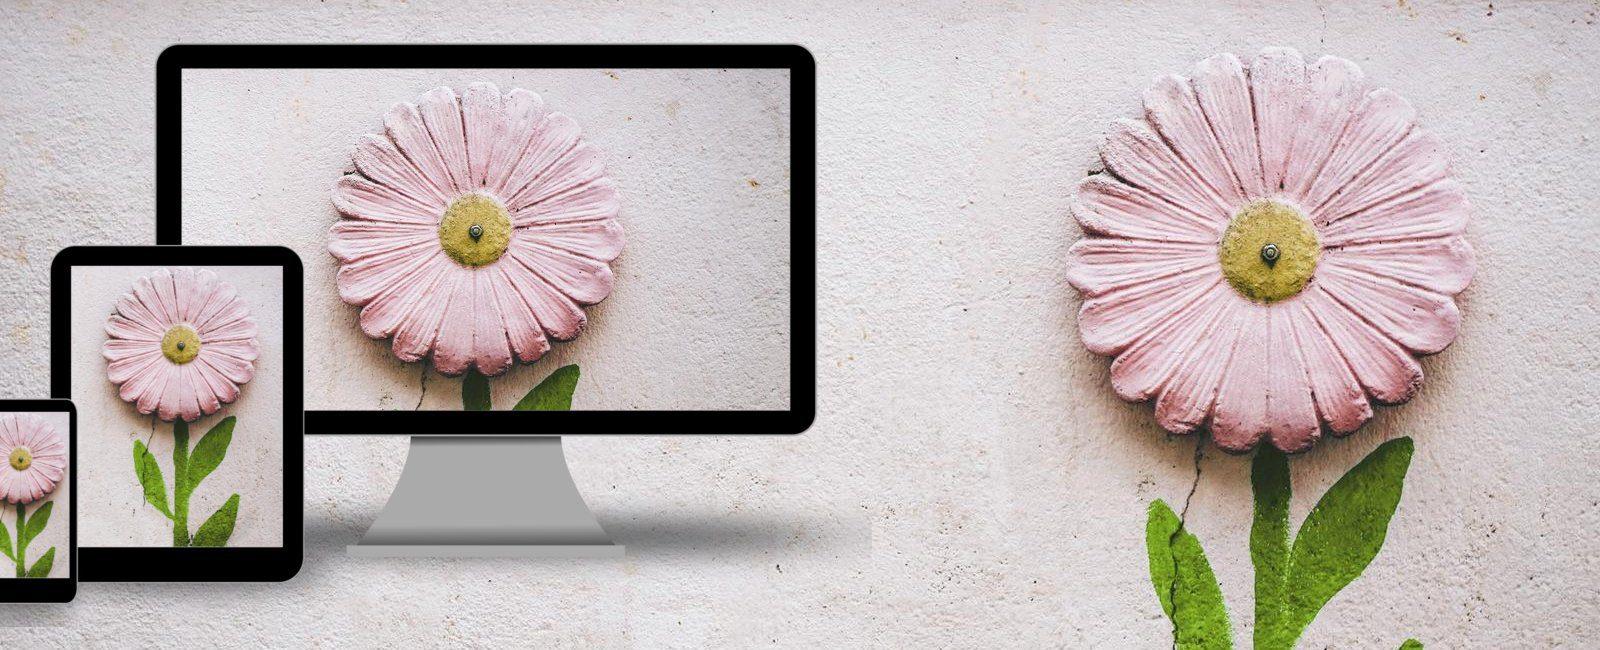 repsonsive webdesign